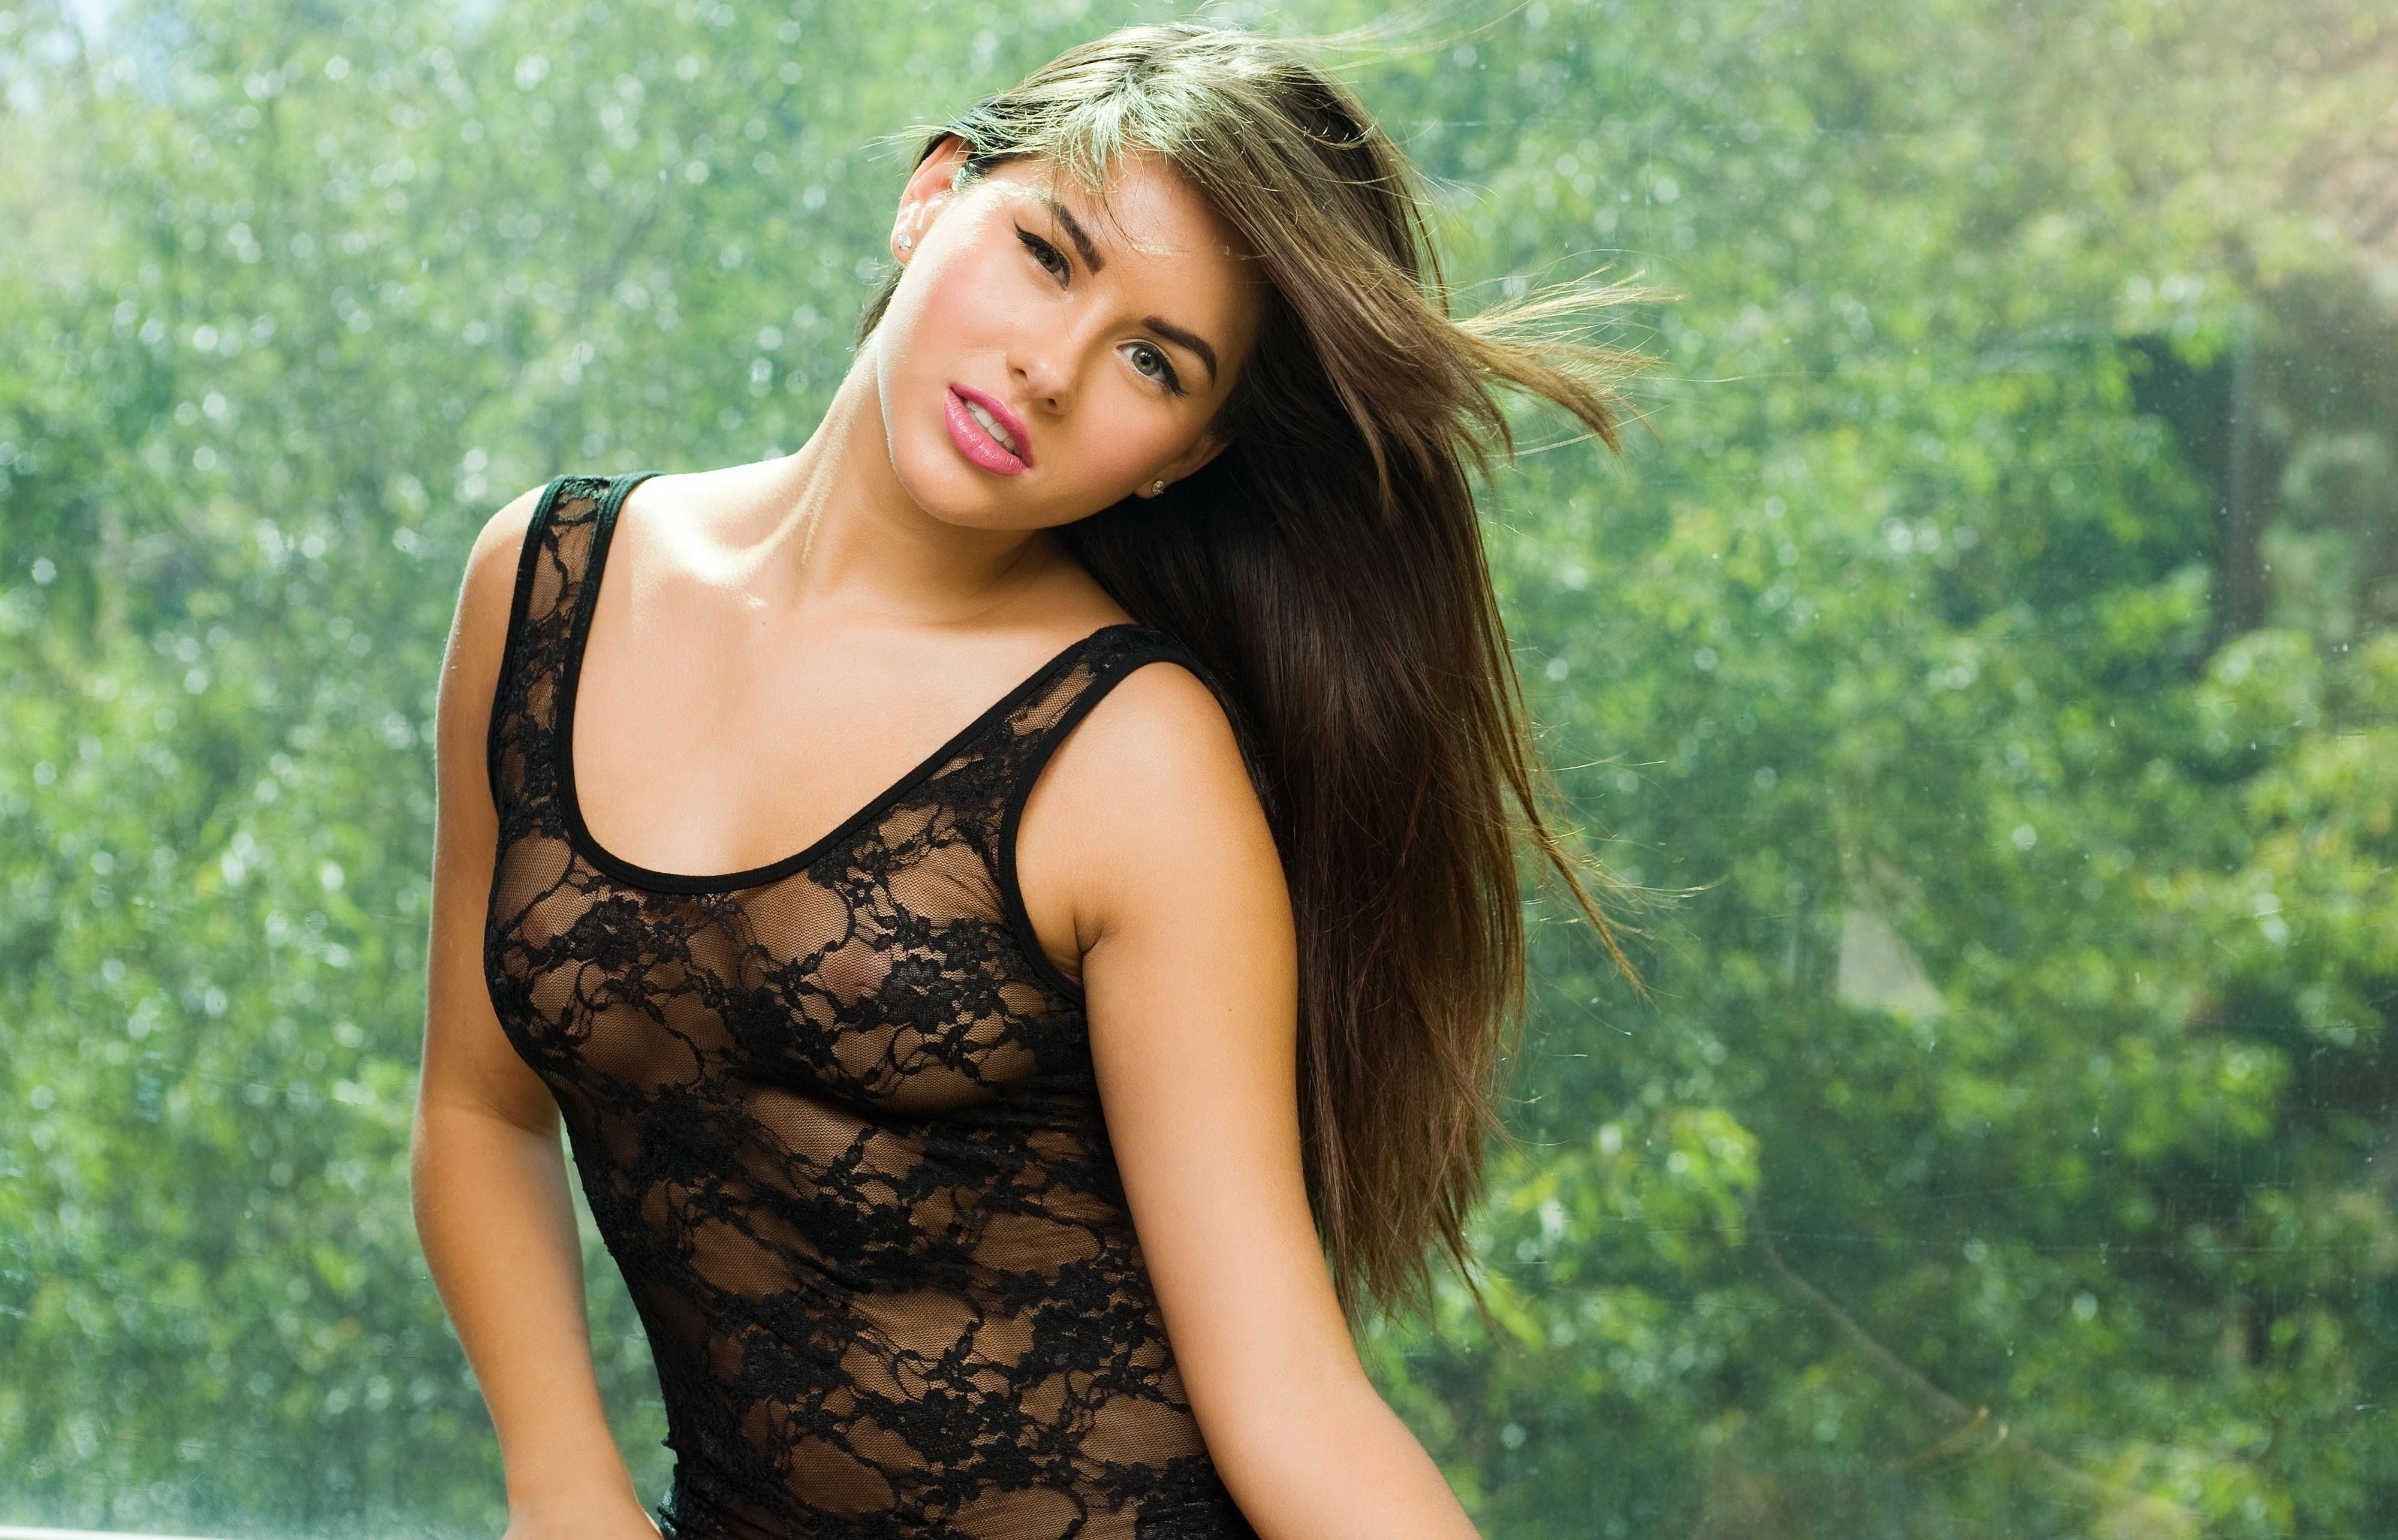 Обои, картинки поиск пентхауз, Sexwall.ru - секс фотки, картинки с